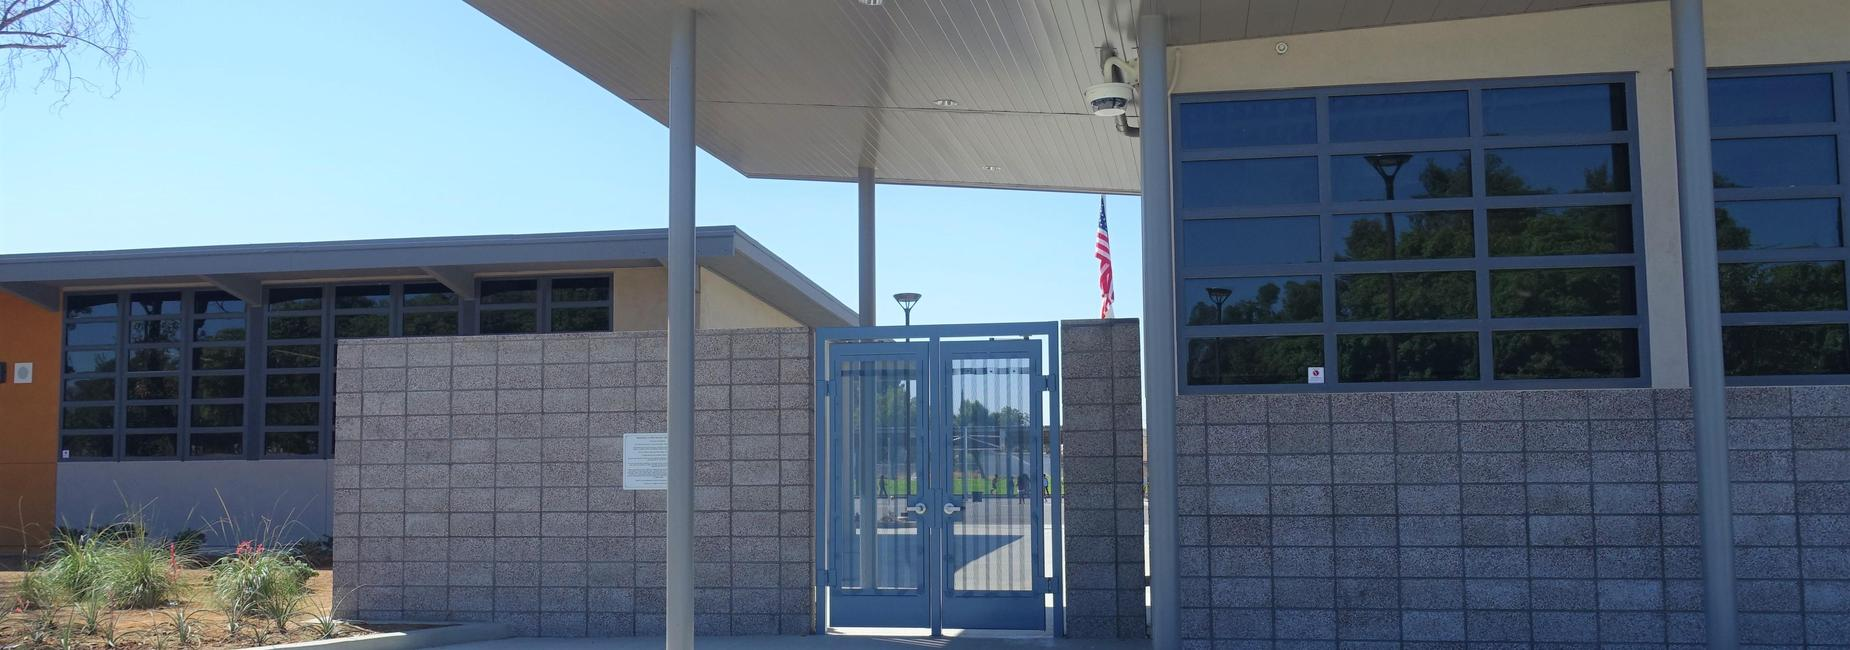 Student Entrance/Exit Gate